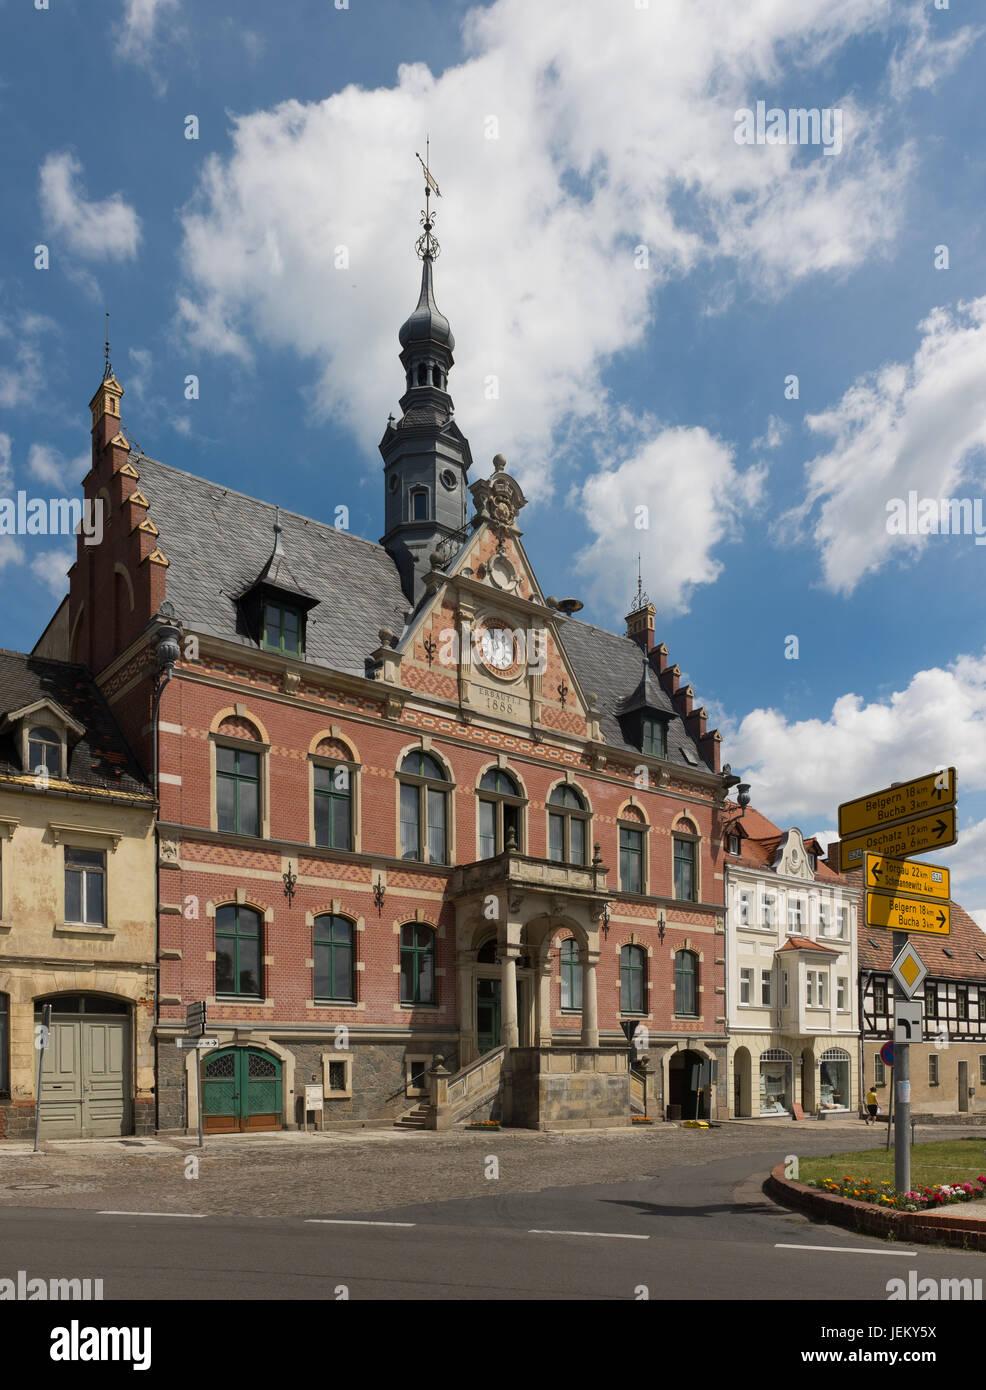 Dahlen, Saxony, June 8th: Rathaus (German for Town Haus) of Dahlen (built on 1888) in Saxony on June 8th, 2017. Stock Photo